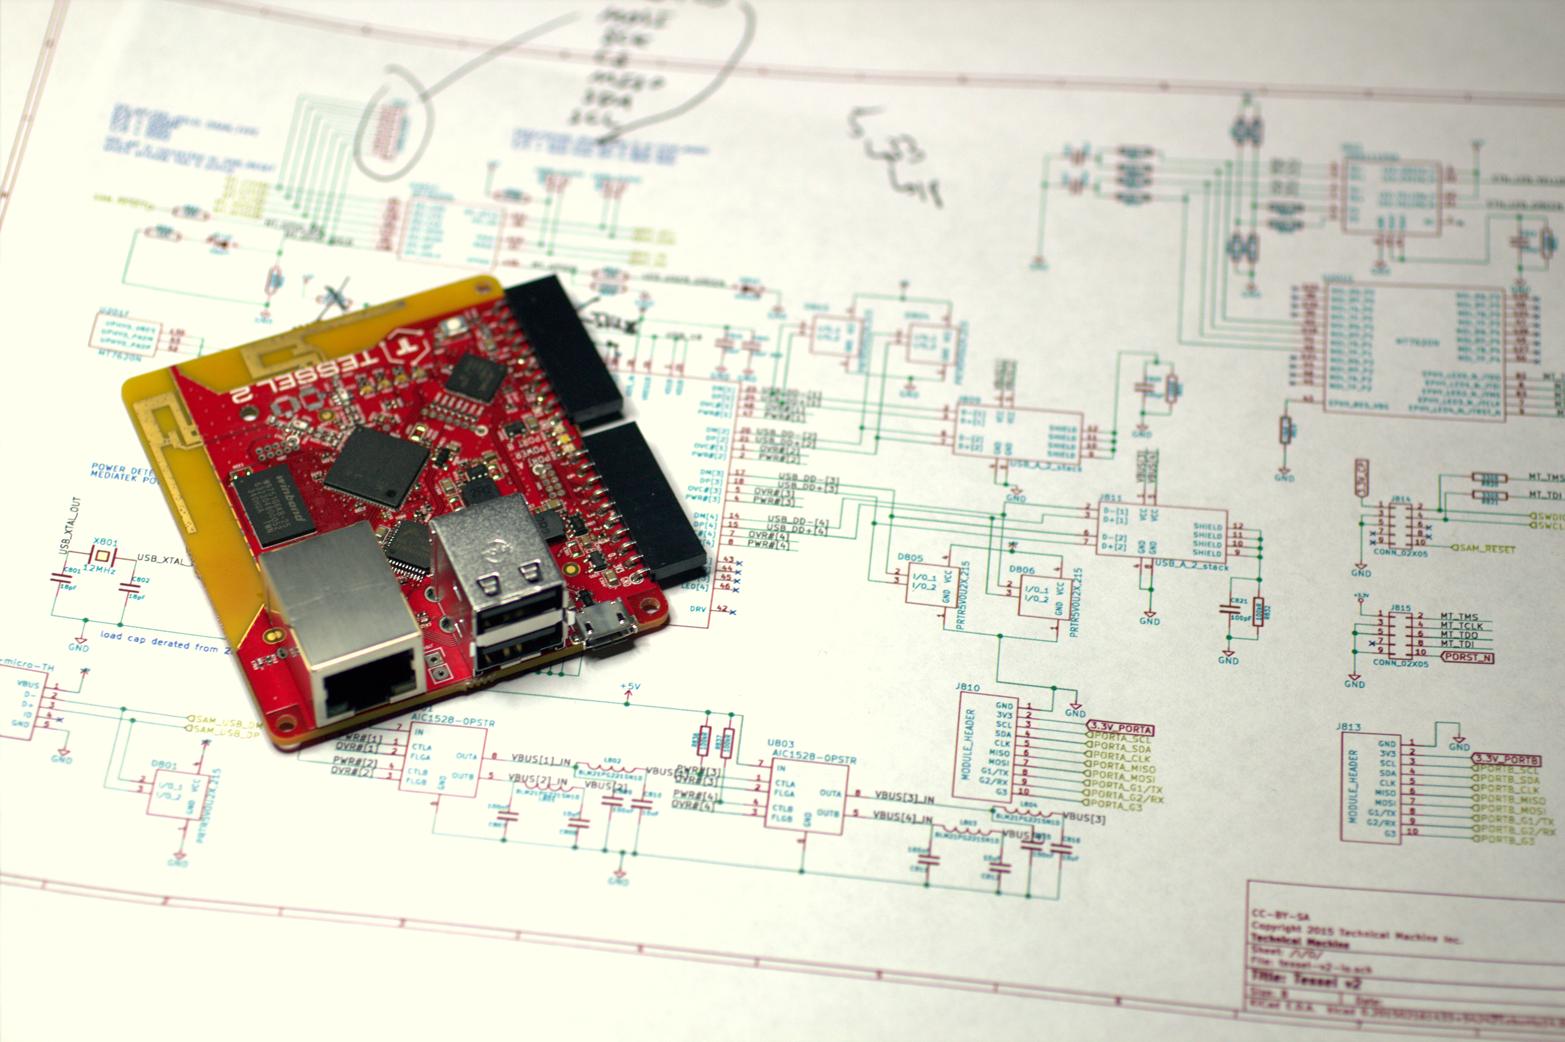 The Tessel 2 board (Photo courtesy Technical Machine)